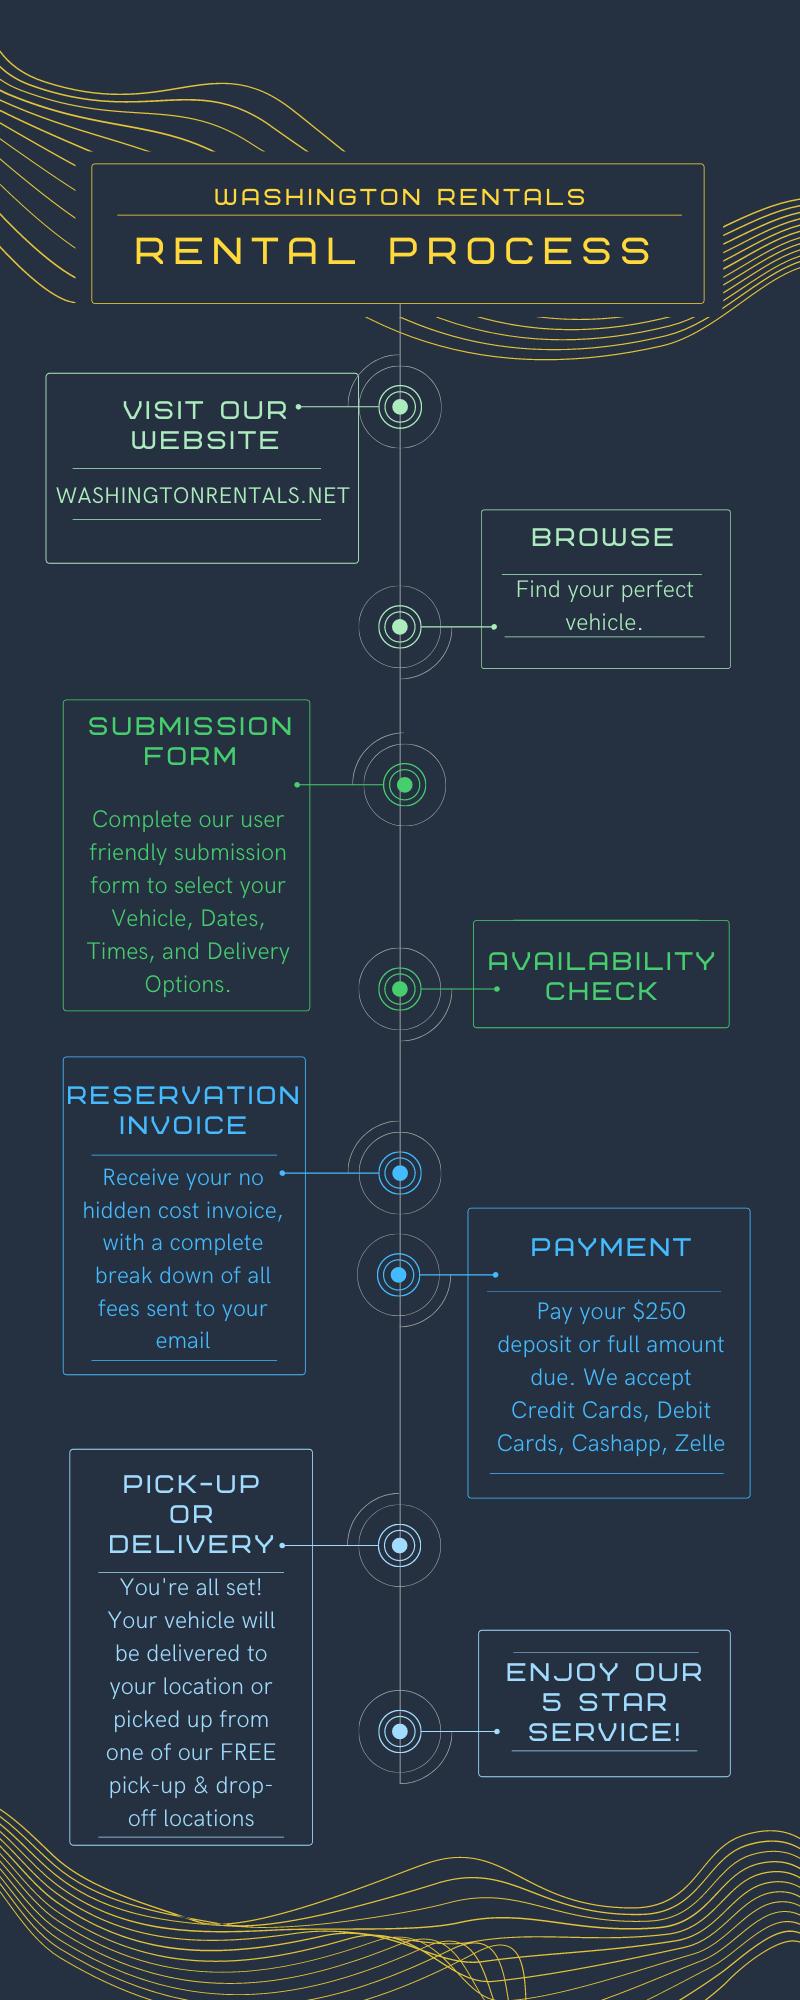 Washington Rentals rental process, How to rent a vehicle.